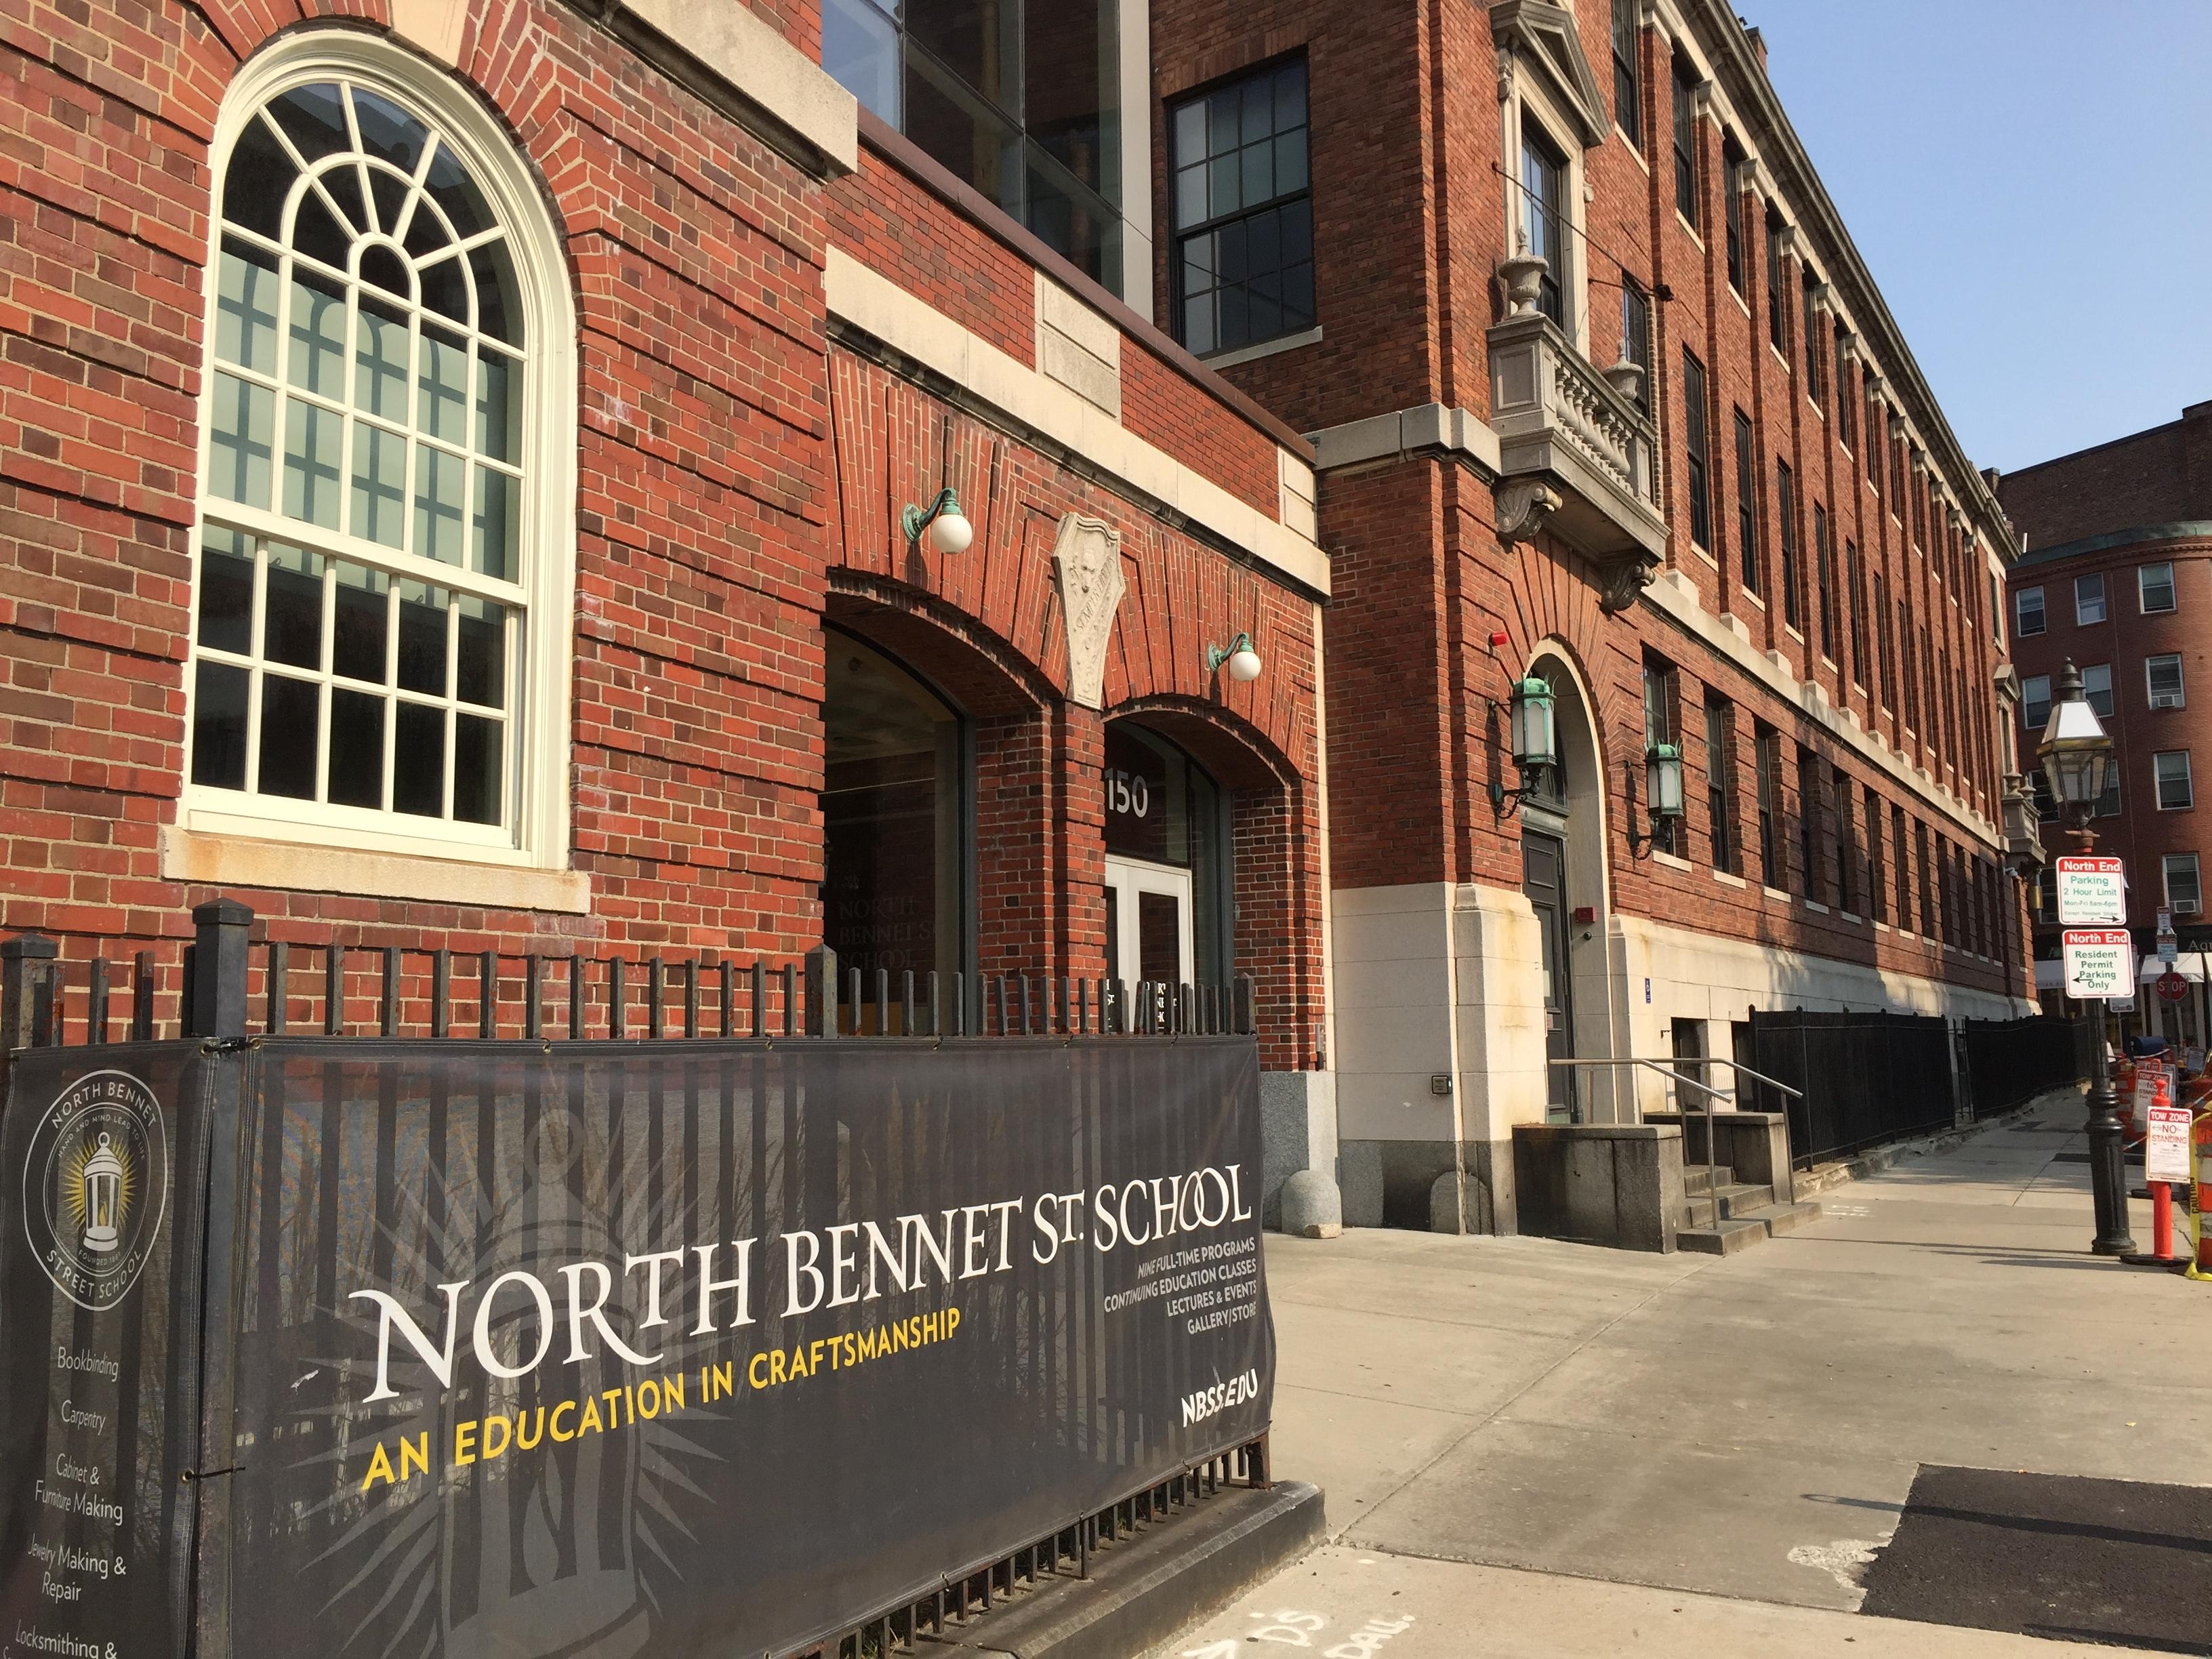 North Bennett Street School